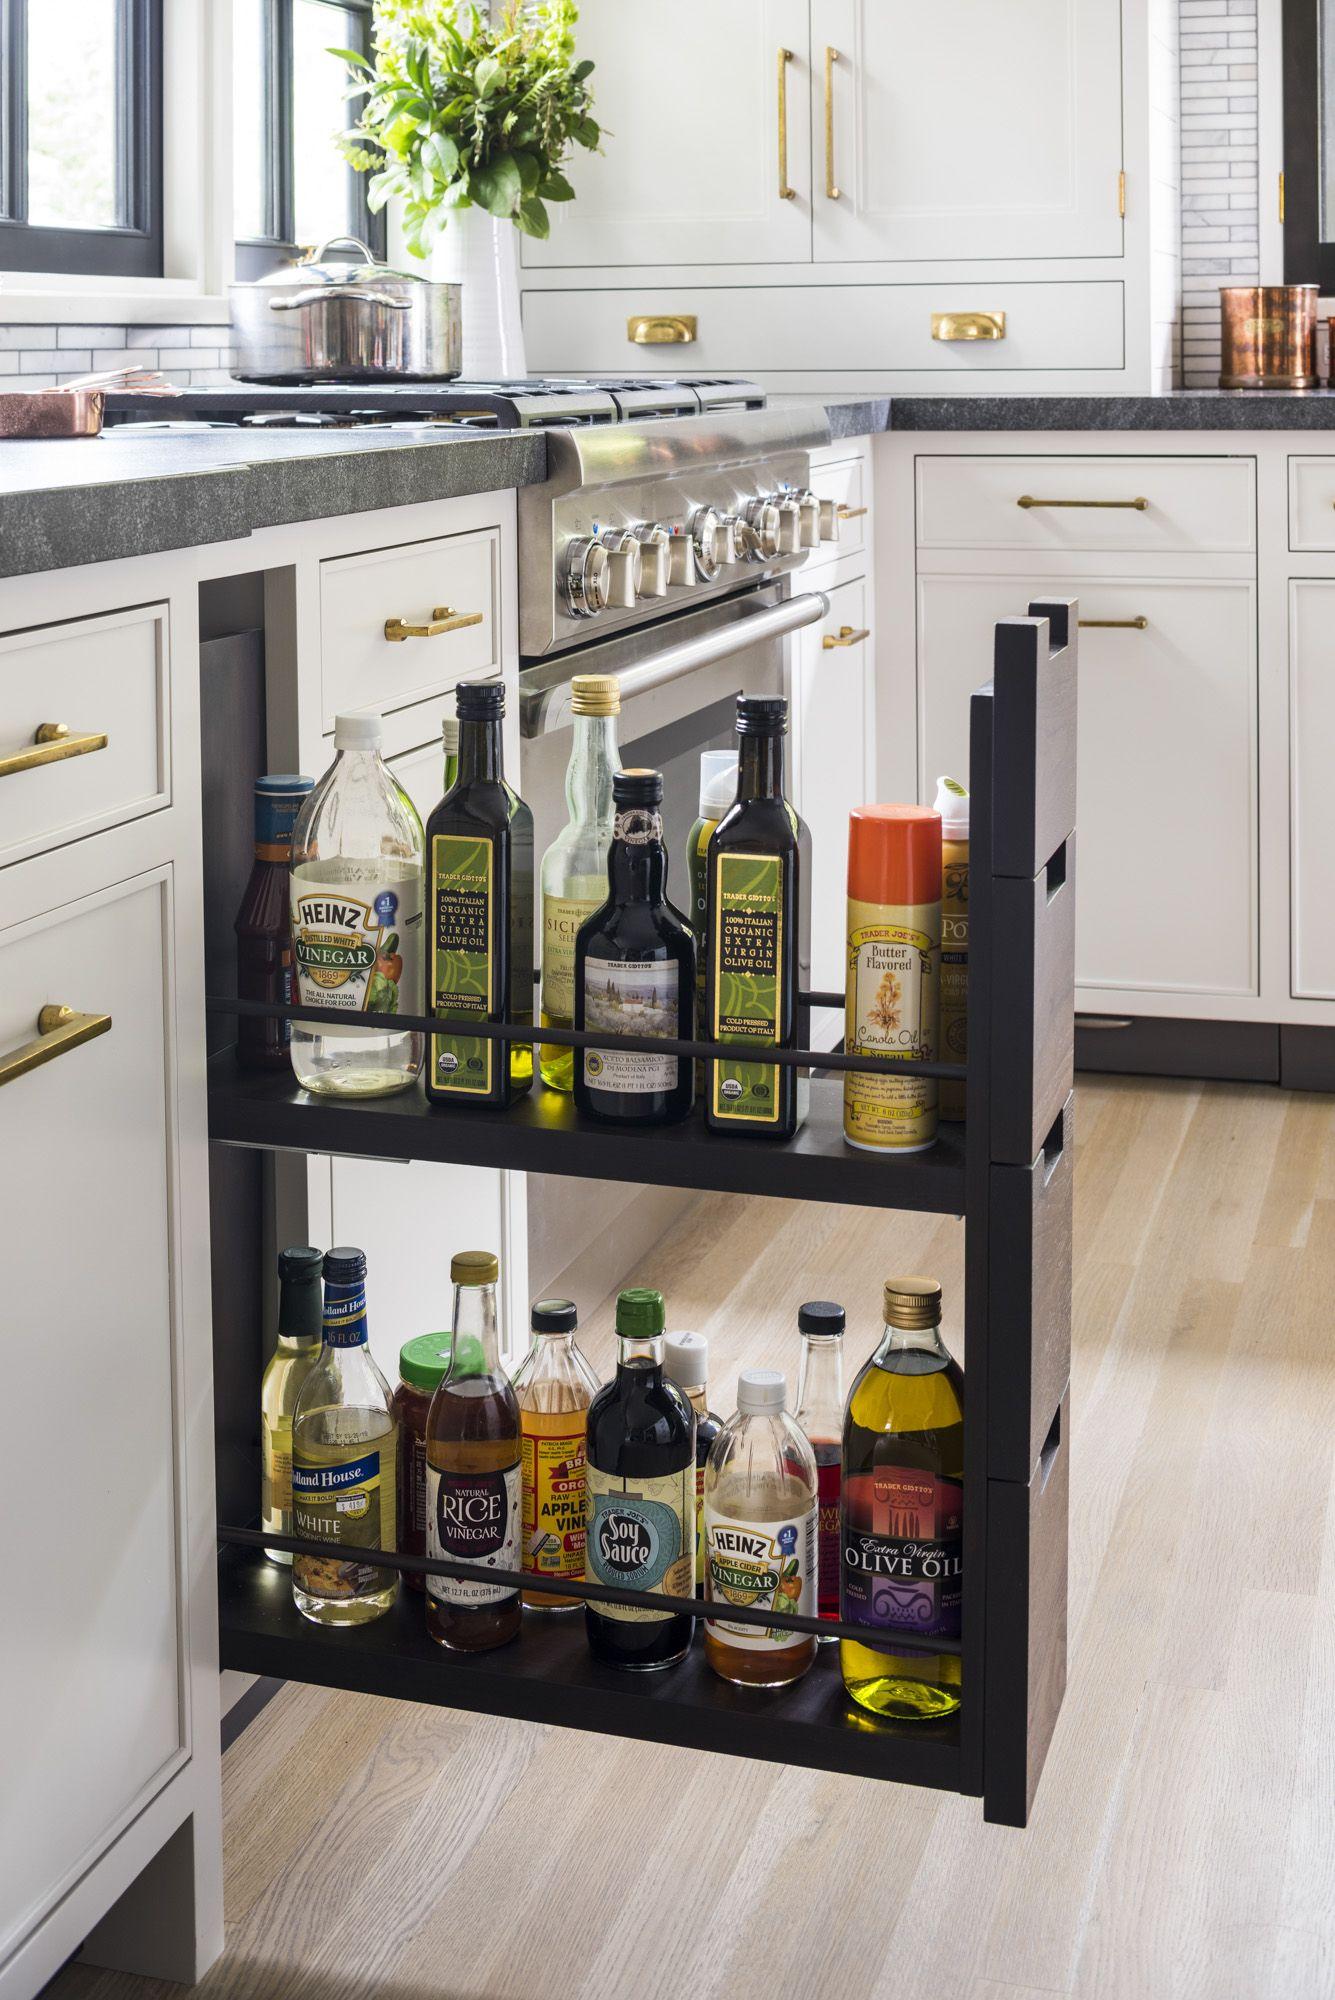 Studio Dearborn Designer Spotlight Thermador Home Appliance Blog Kitchen Renovation Kitchen Design Kitchen Interior